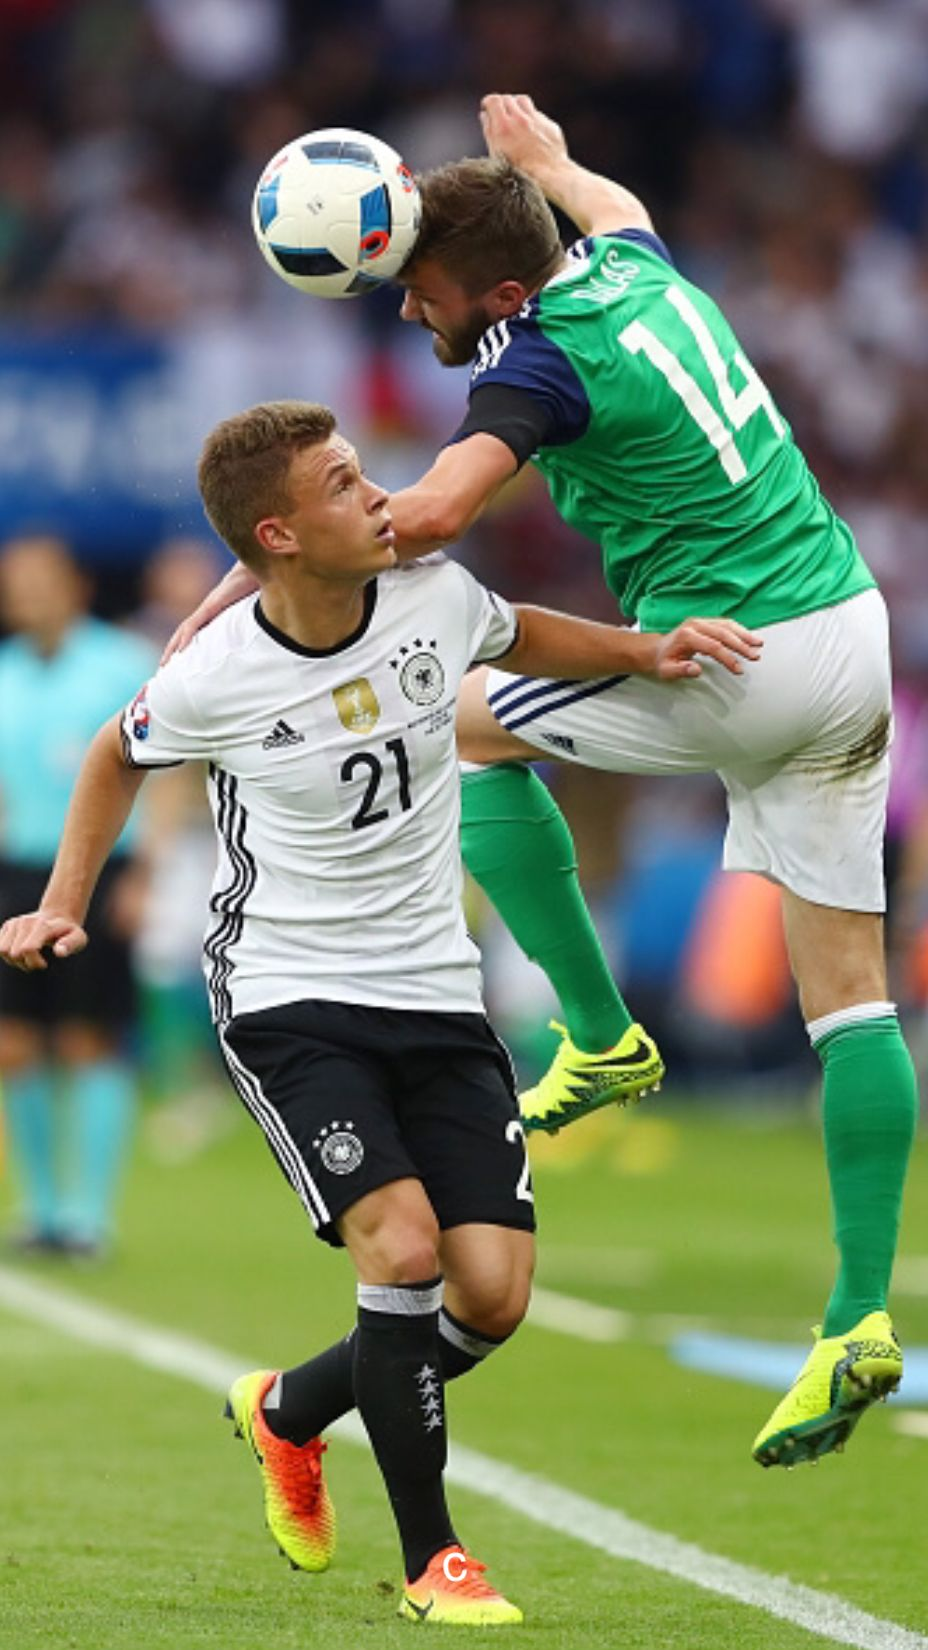 Joshua Kimmich Euro 2016 vs Northern Ireland